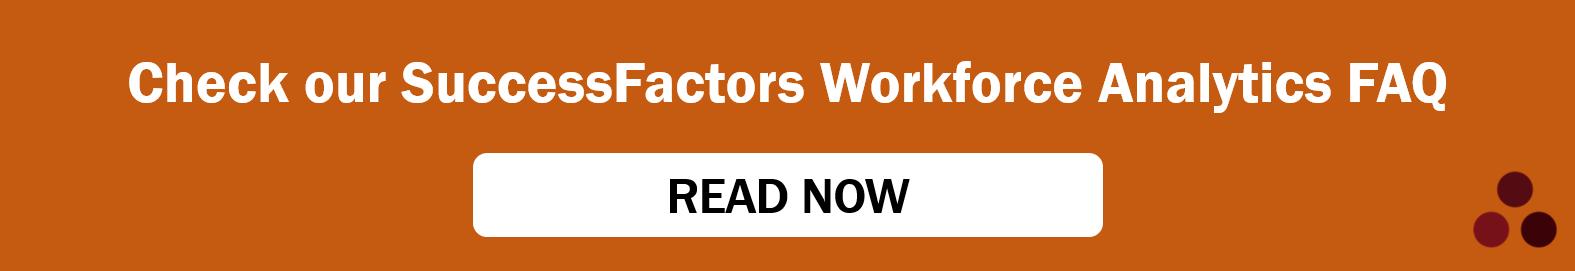 Read our SuccessFactors Workforce Analytics FAQ